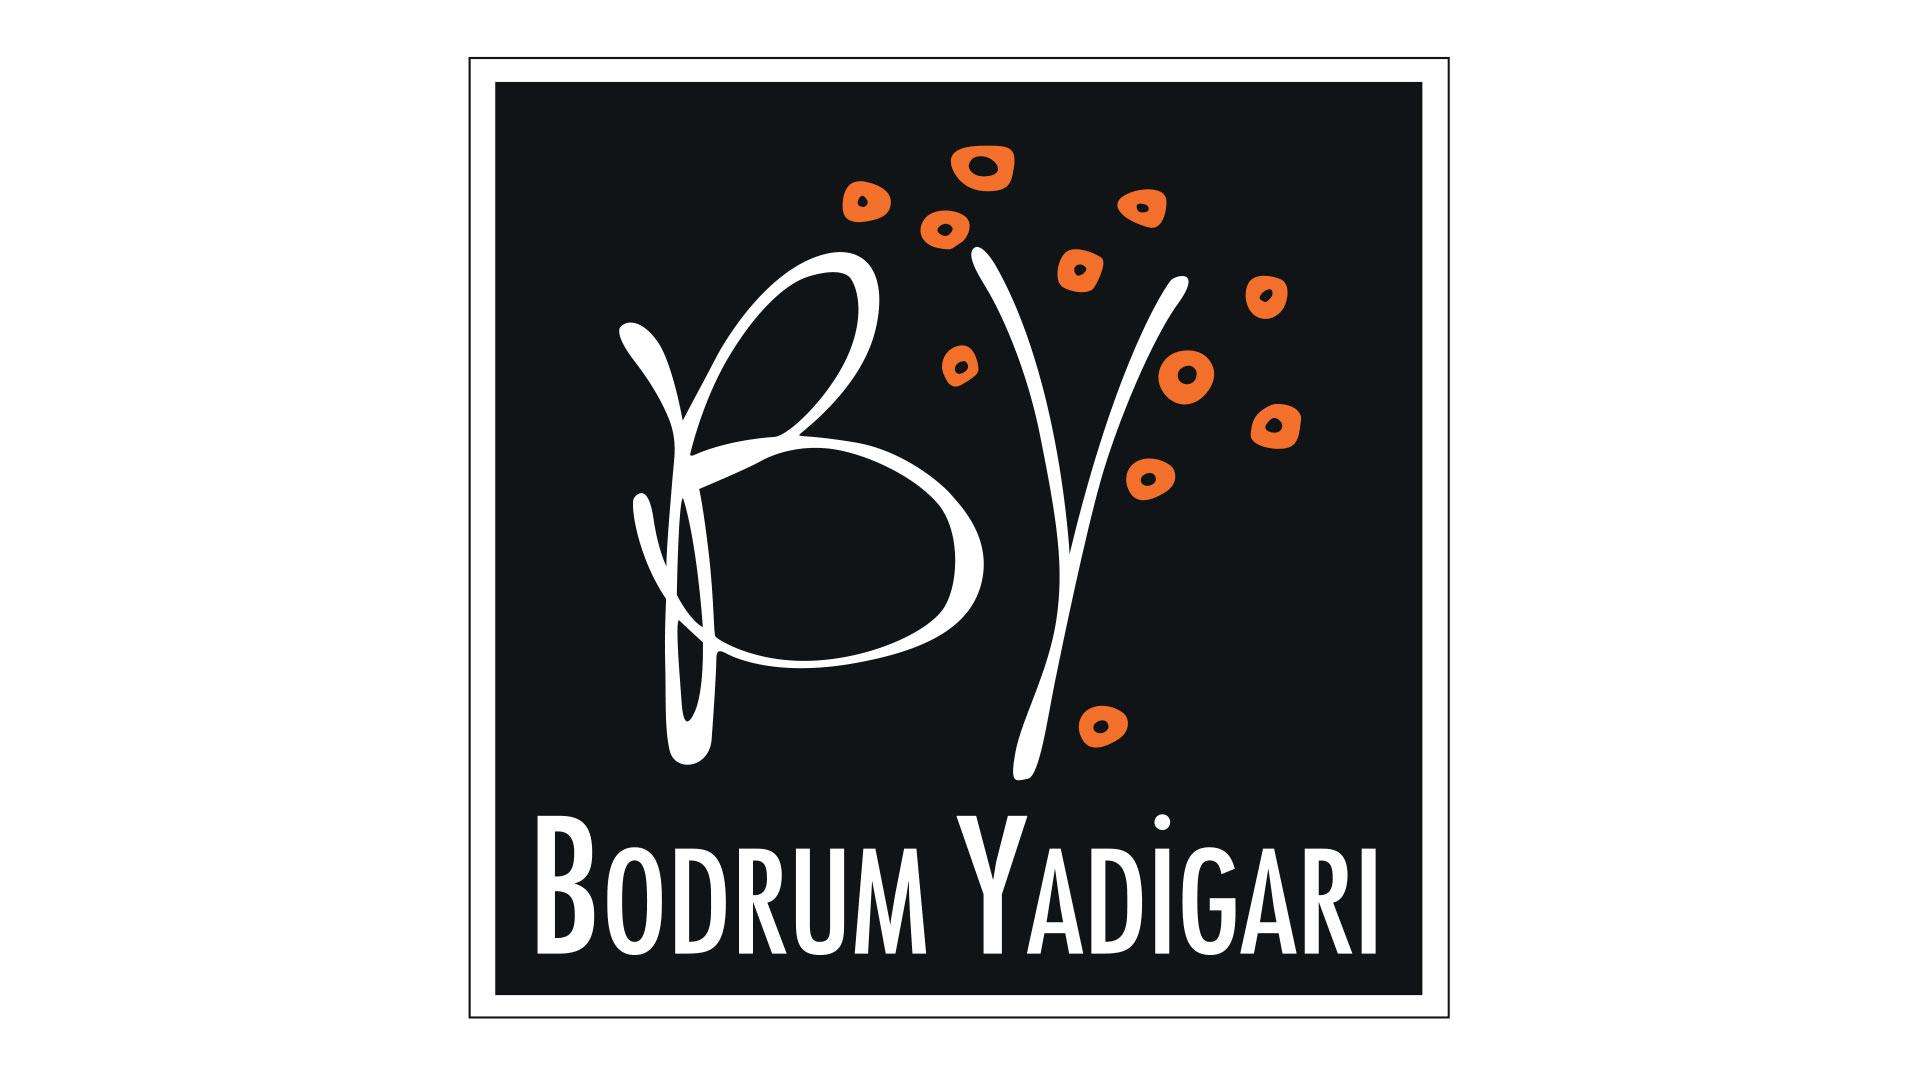 Bodrum-Yadigarı-logo